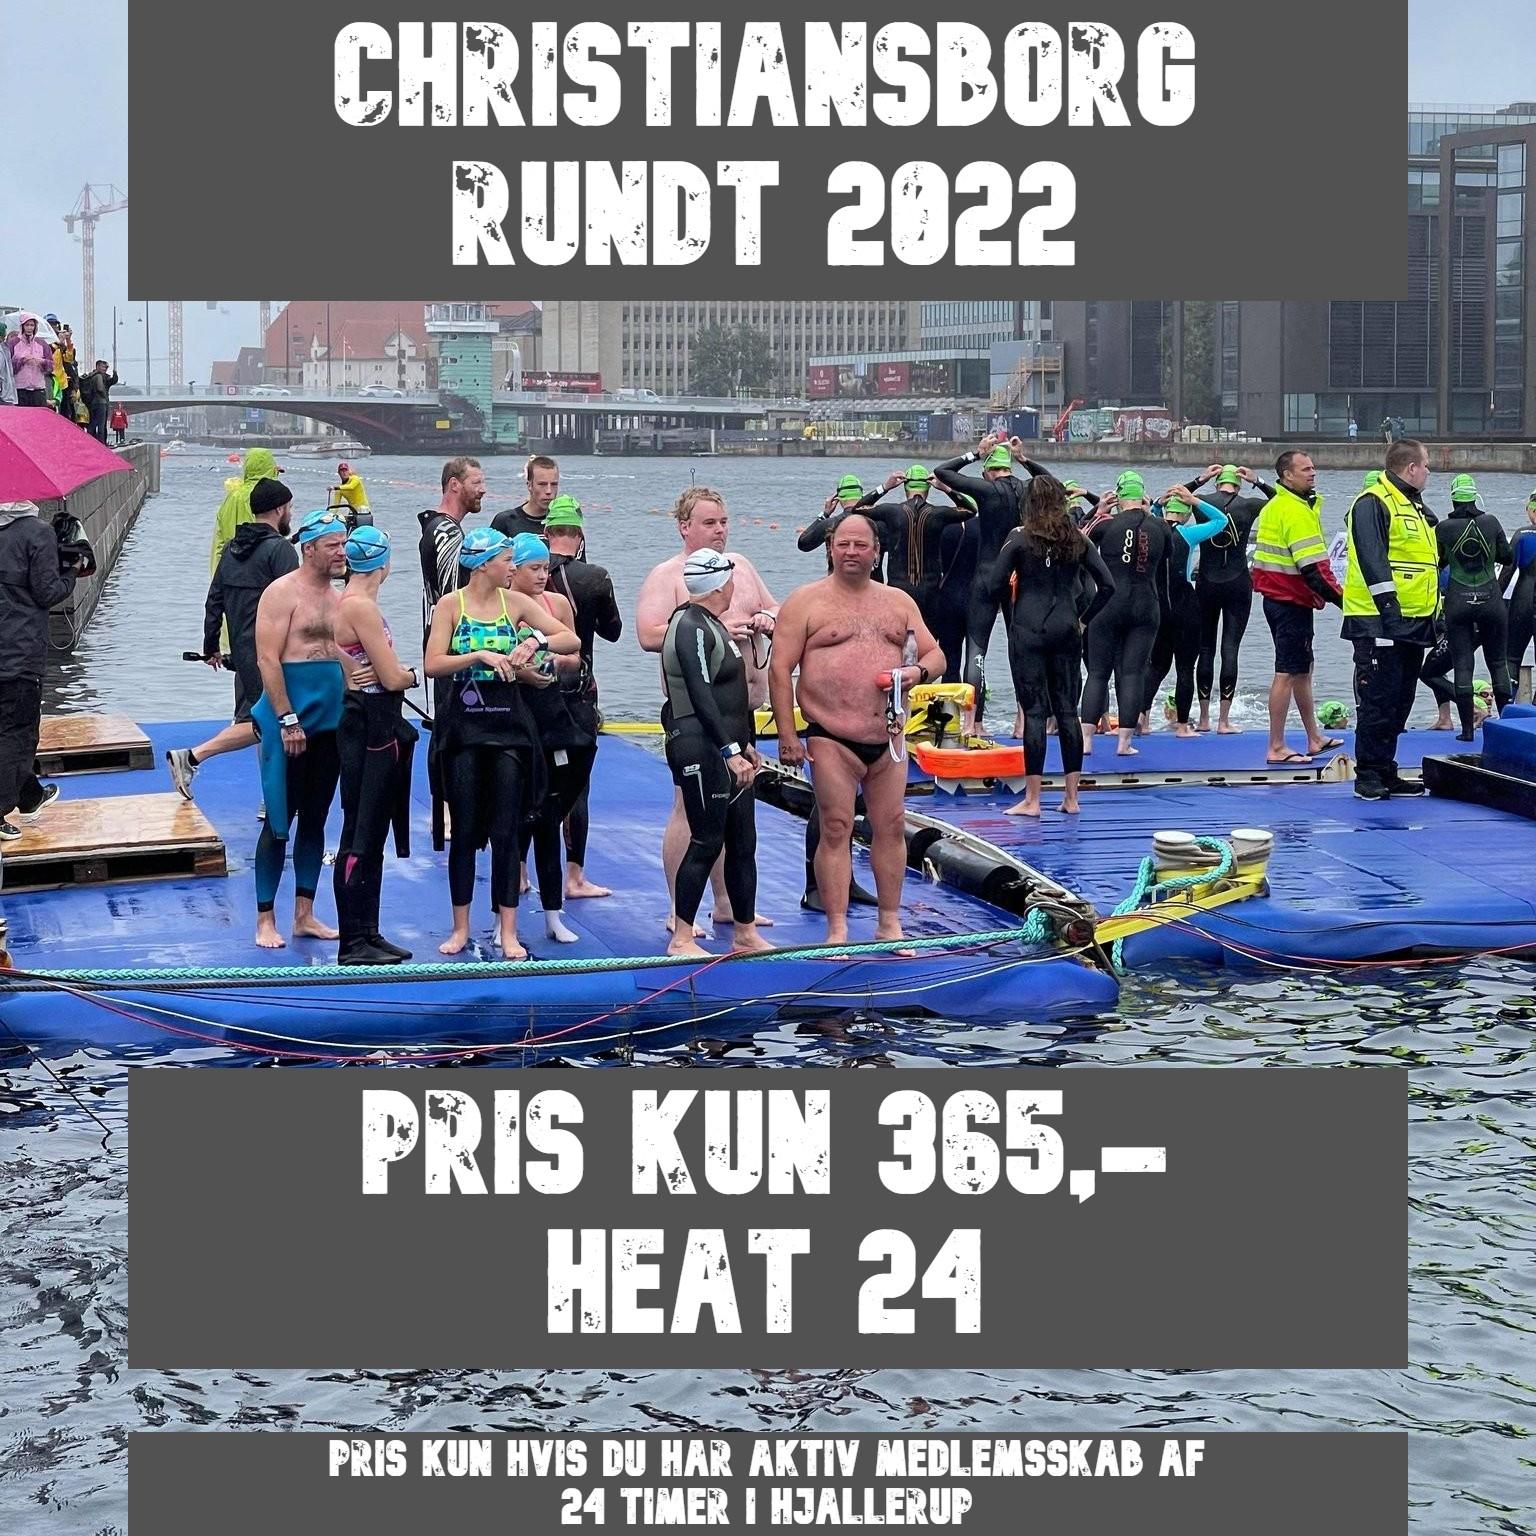 Christiansborg rundt 2022